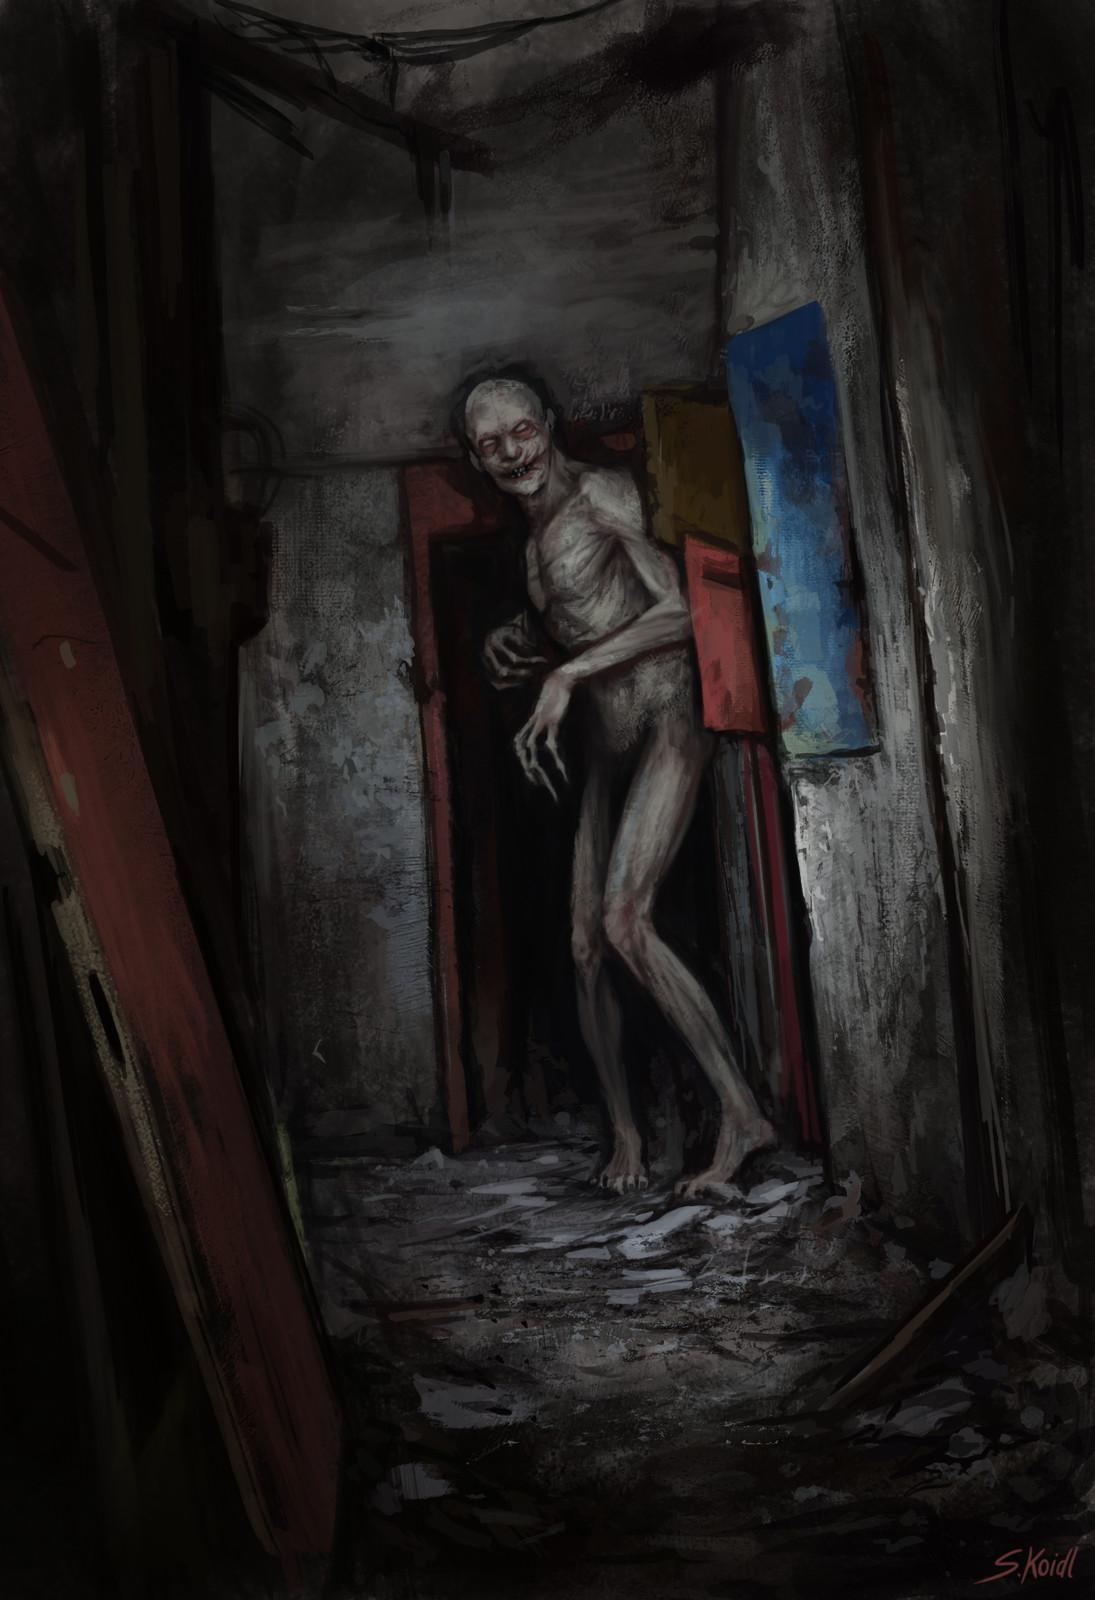 A Chernobyl Horror Story 4